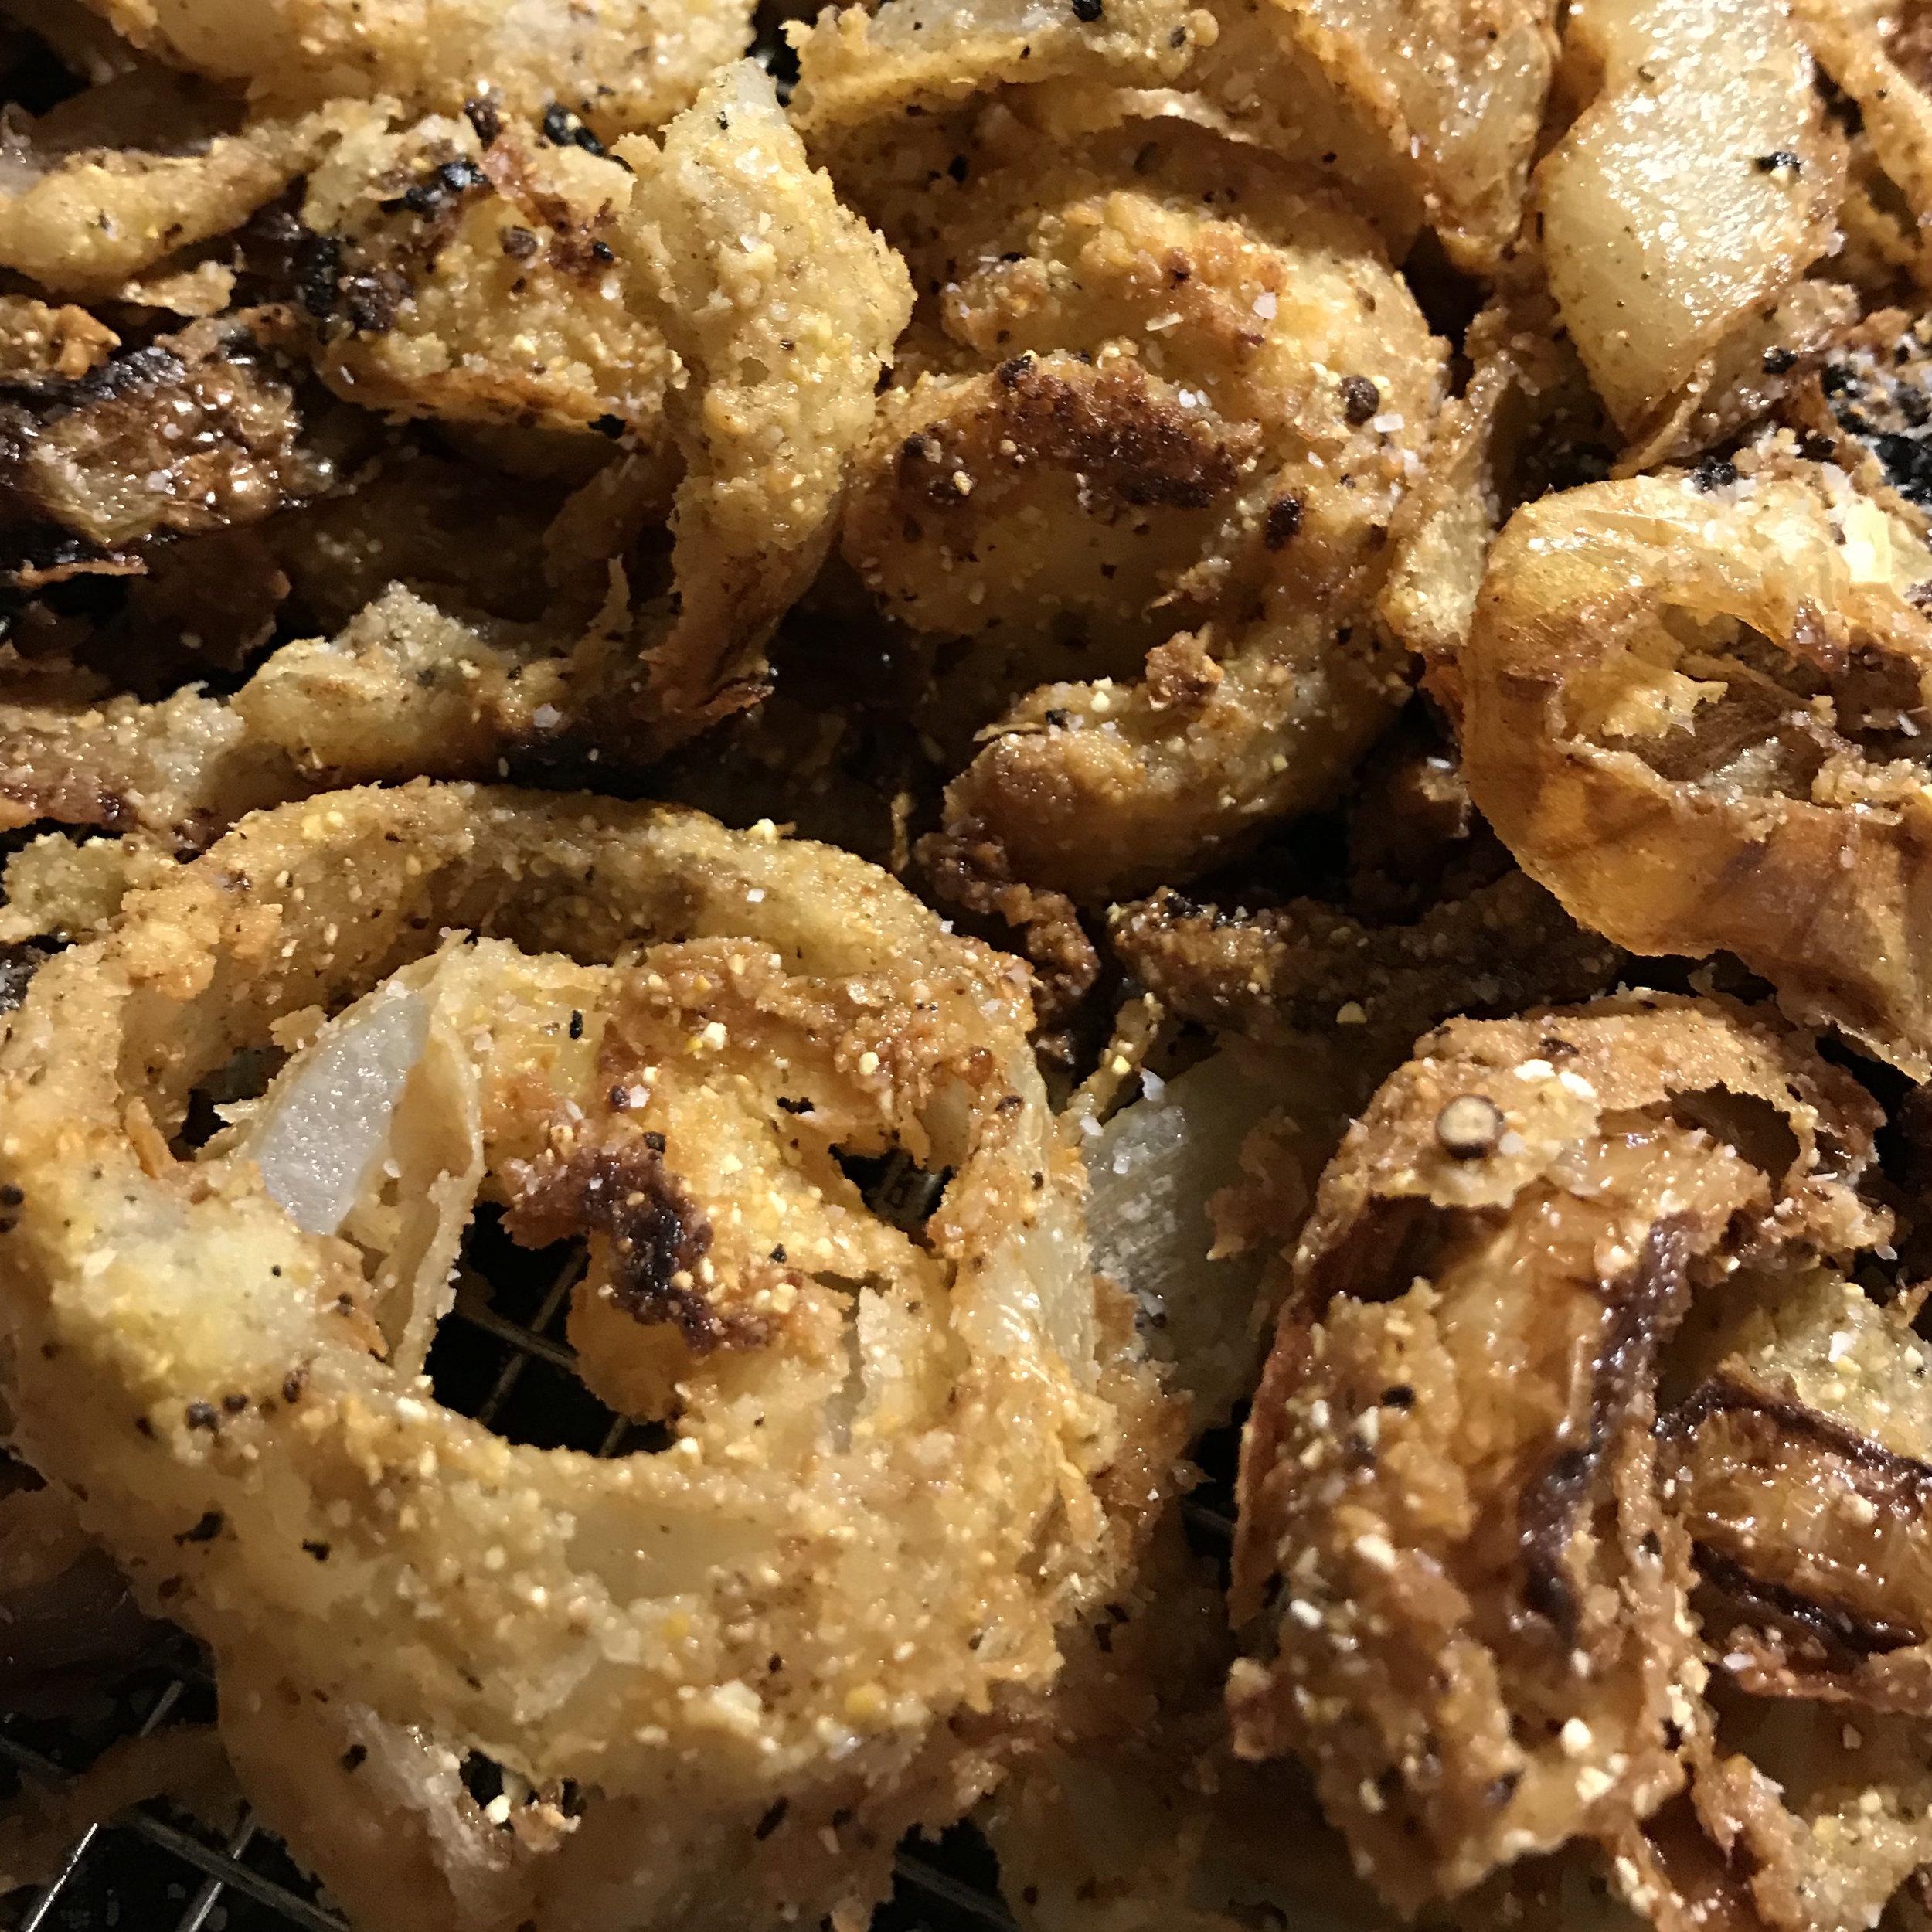 Cornmeal-Fried Onion Rings . At Home . Week 8